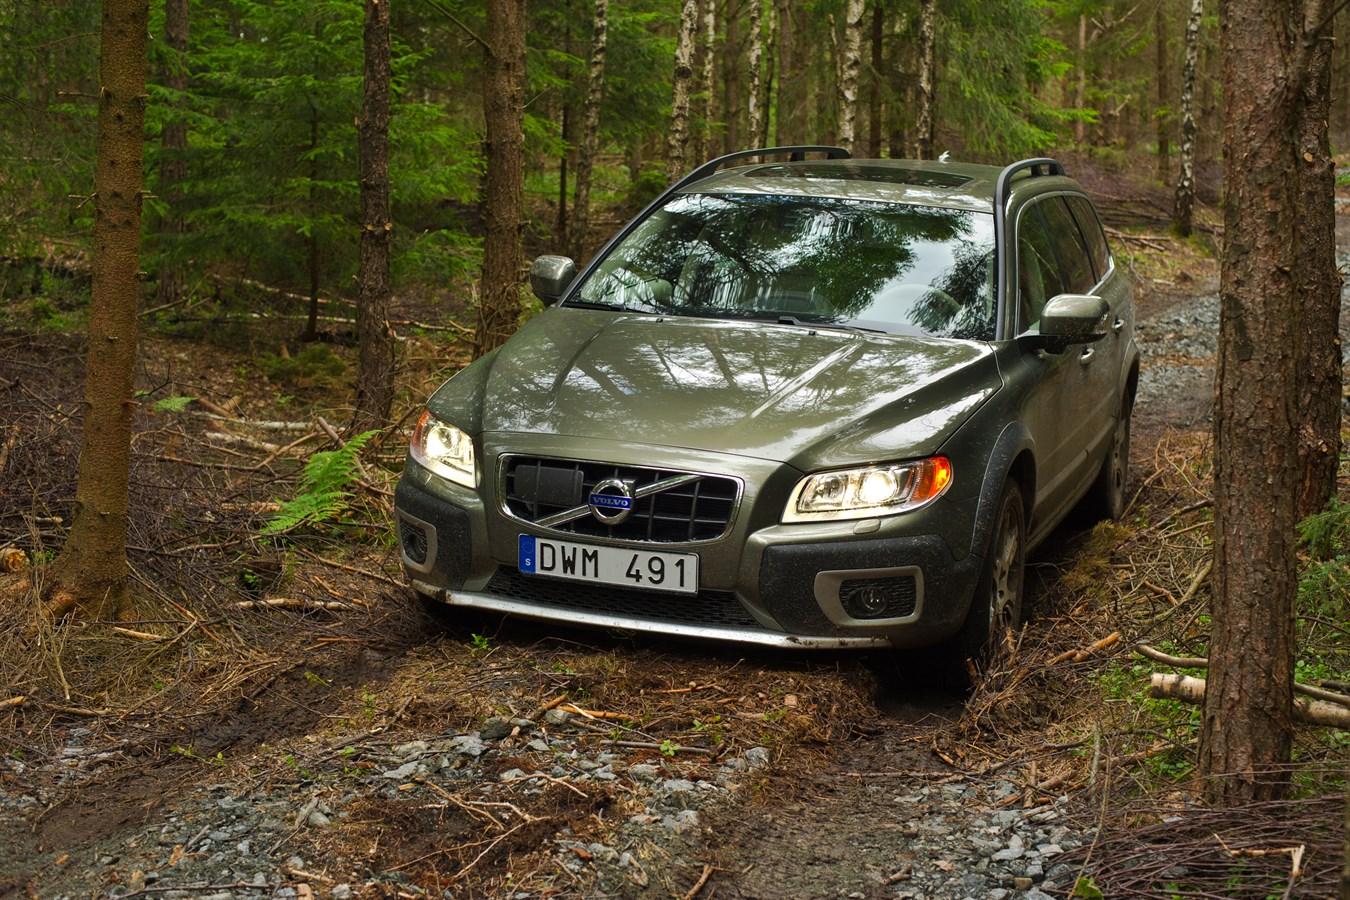 Volvo XC70 - model year 2012 - Volvo Cars Global Media Newsroom